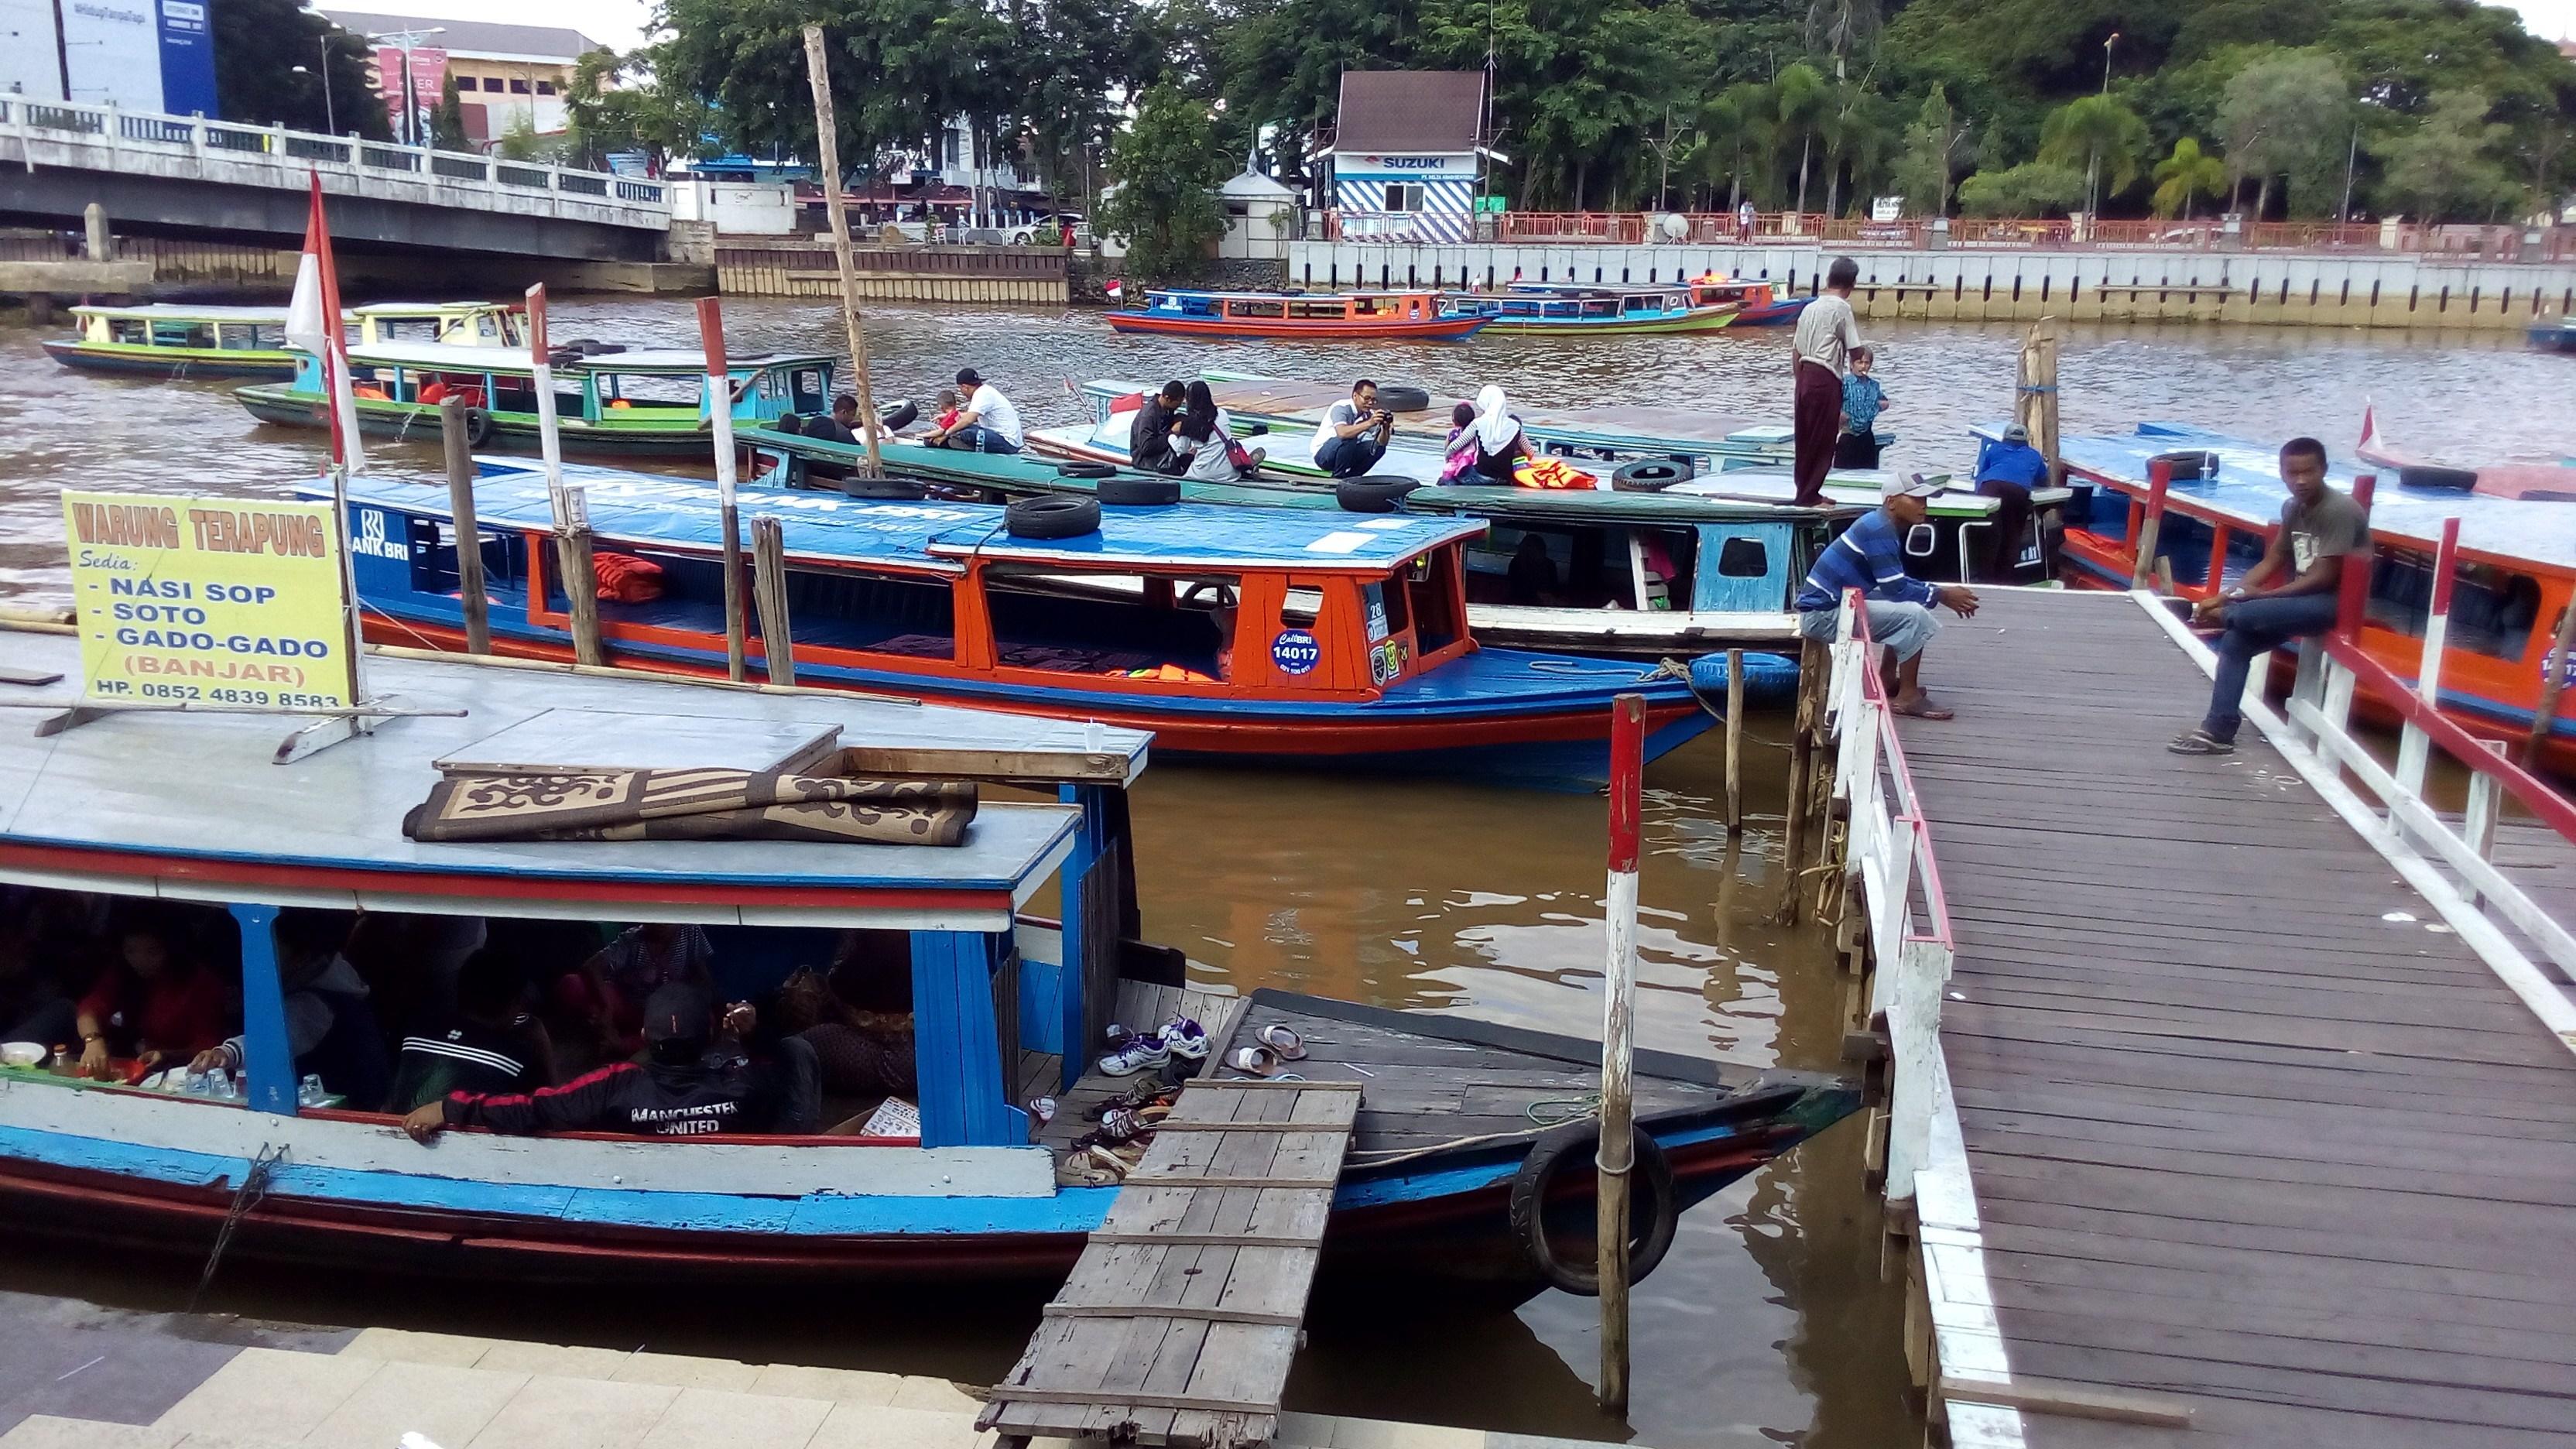 Pulau Kembang Wisata Banjarmasin Kalsel Taman Siring Sungai Martapura Kab